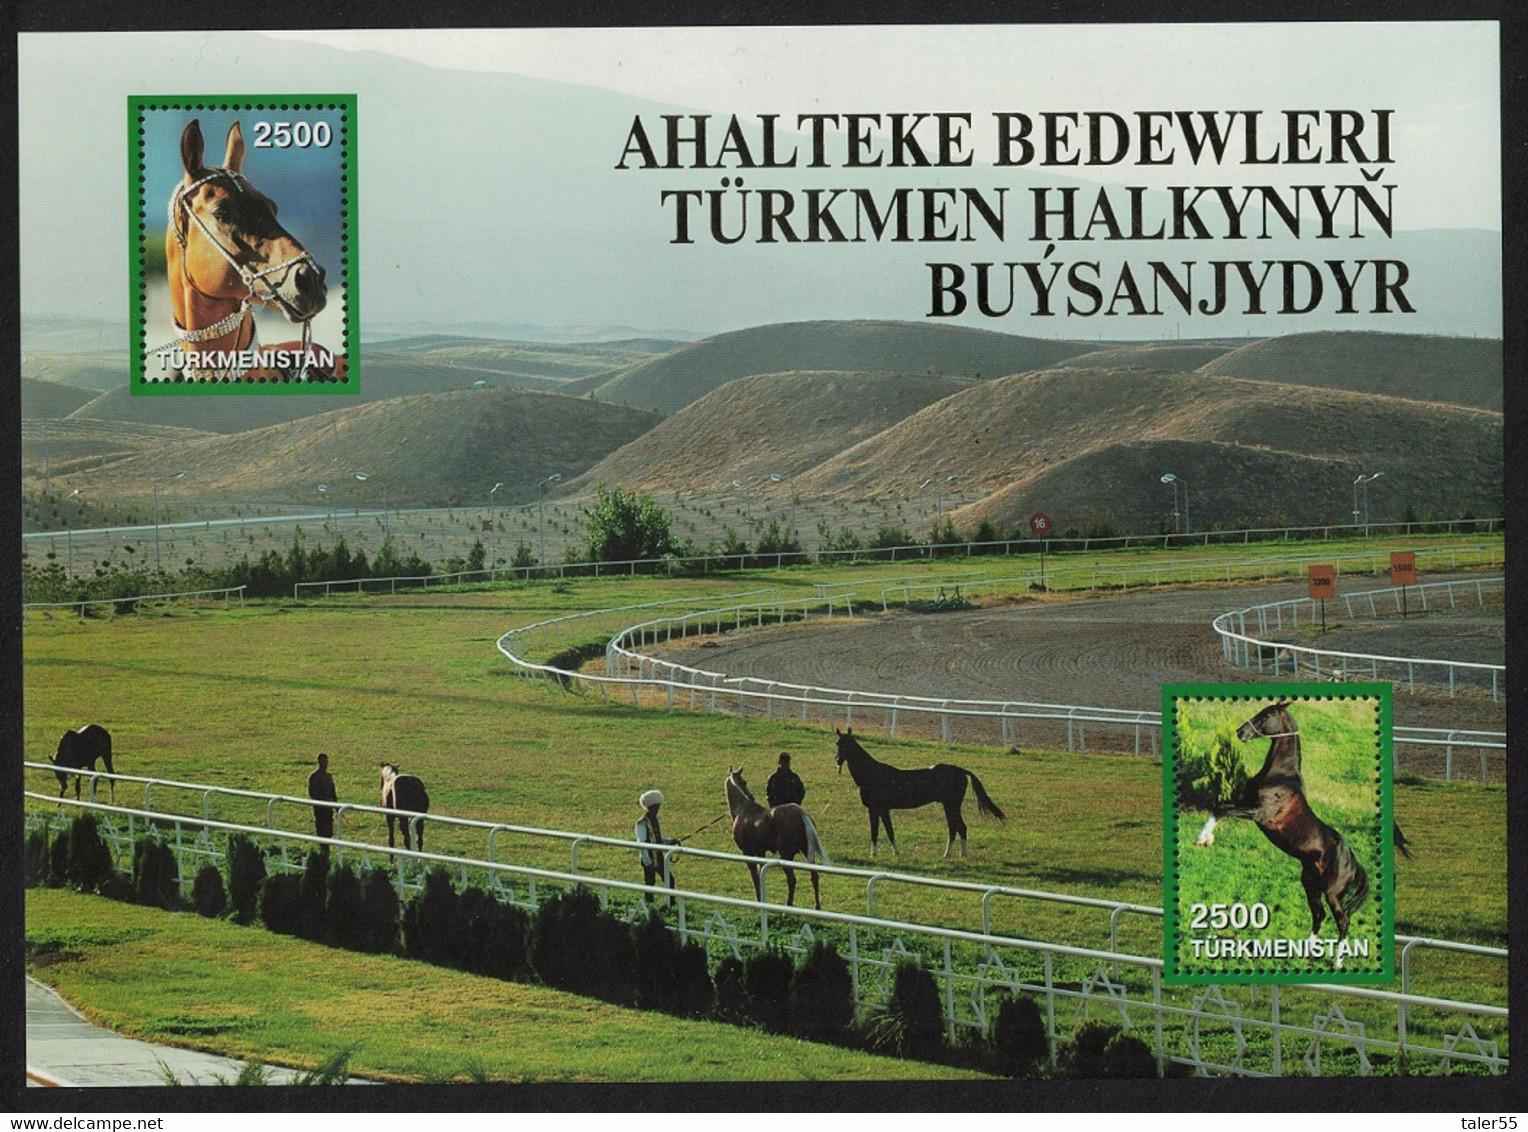 Turkmenistan Akhal-Teke Horse Wearing Decorative Bridle Sheet 2005 MNH SG#MS120a CV£8.50 - Turkmenistan